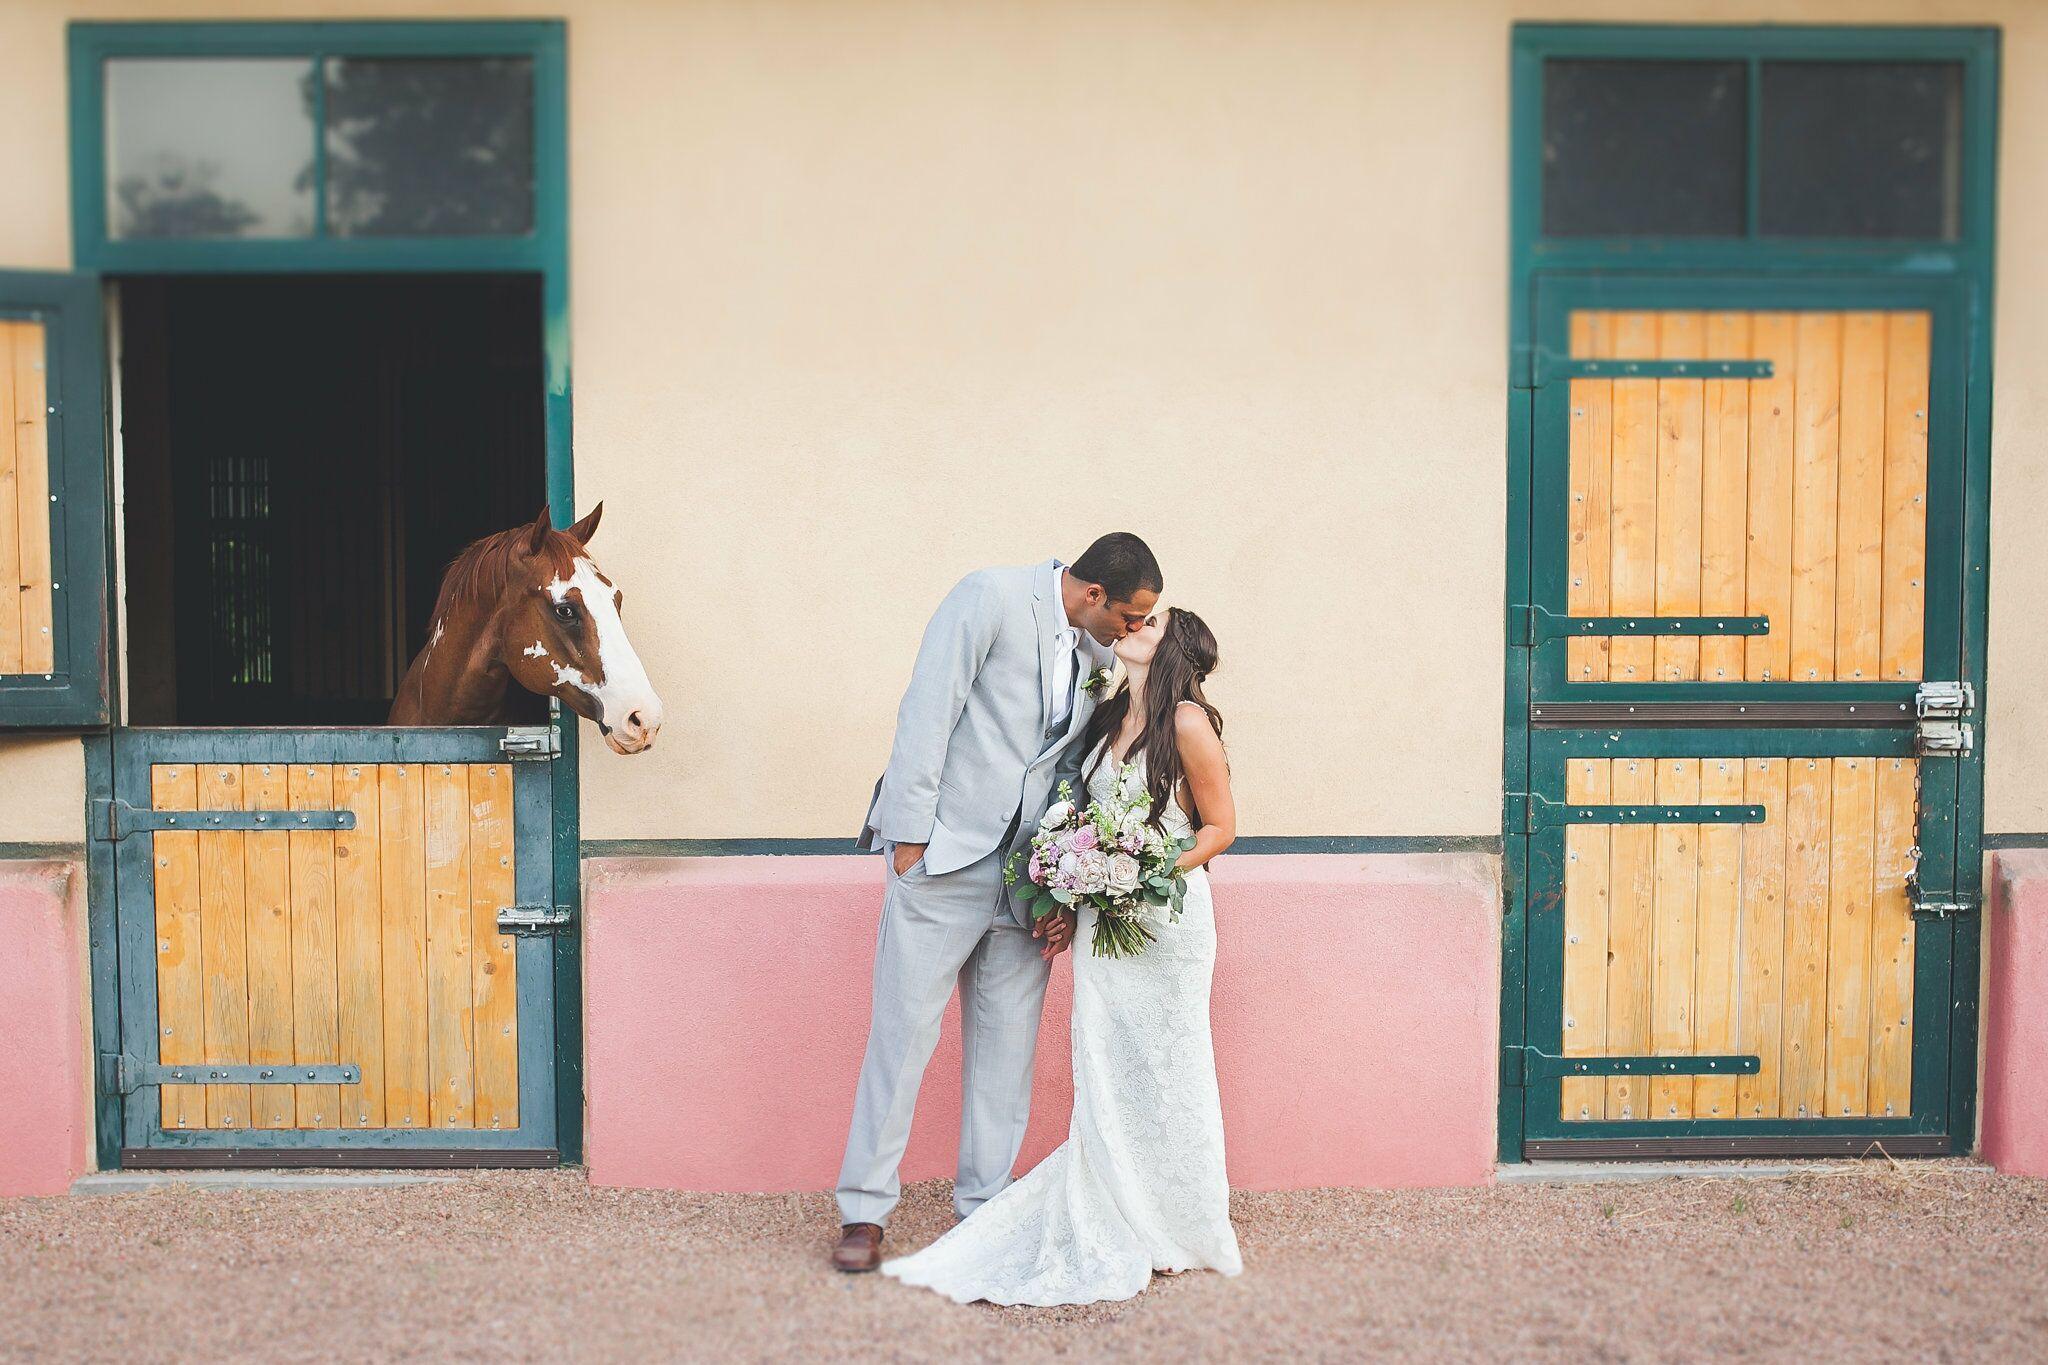 Cheap Wedding Dresses Albuquerque: A Rustic Outdoor Wedding At La Mesita Ranch In Santa Fe